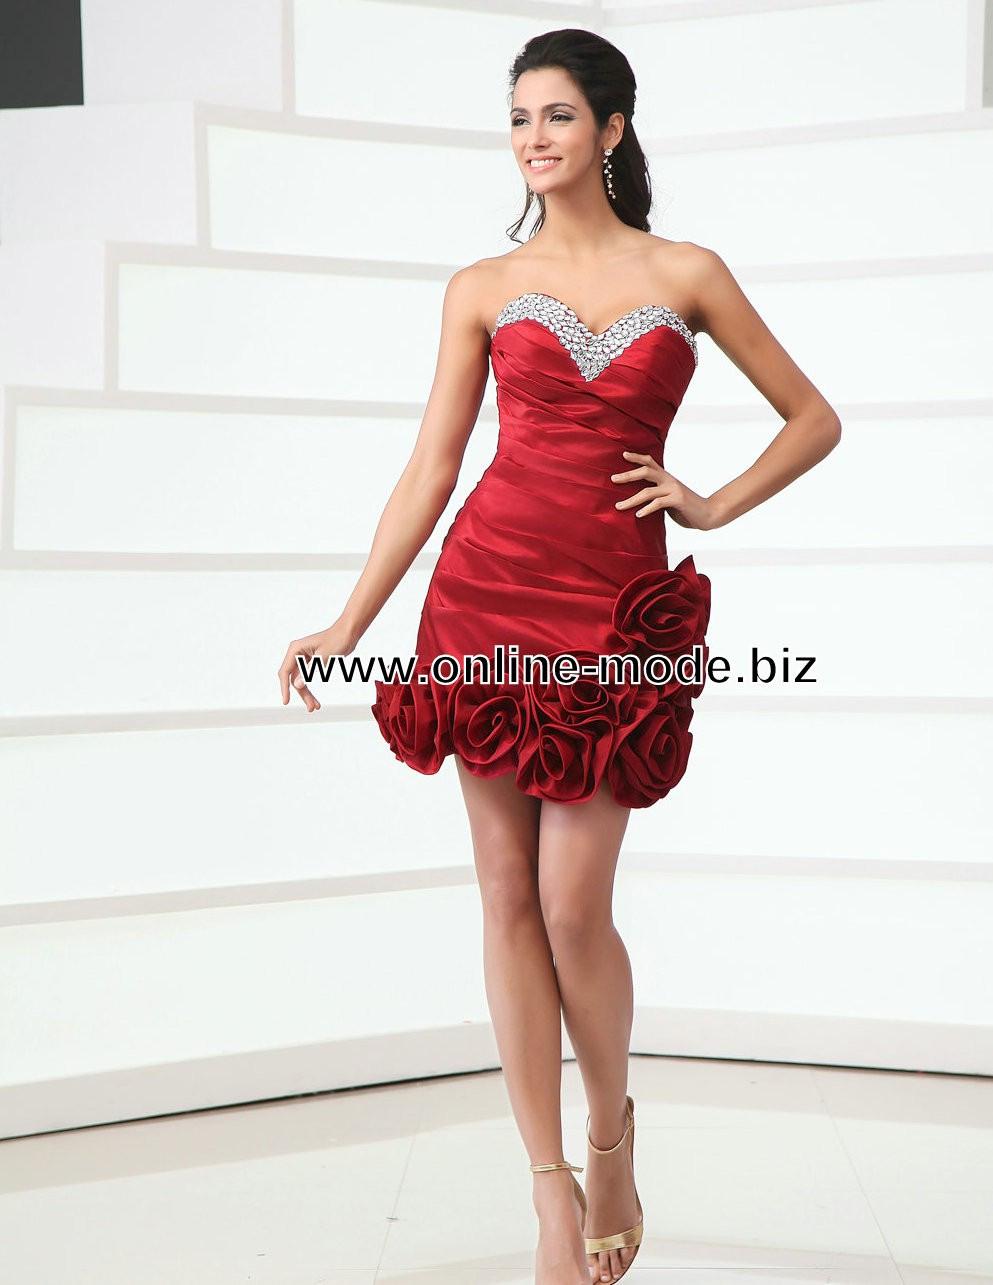 17 Coolste Kurzes Abendkleid Ärmel20 Coolste Kurzes Abendkleid Vertrieb